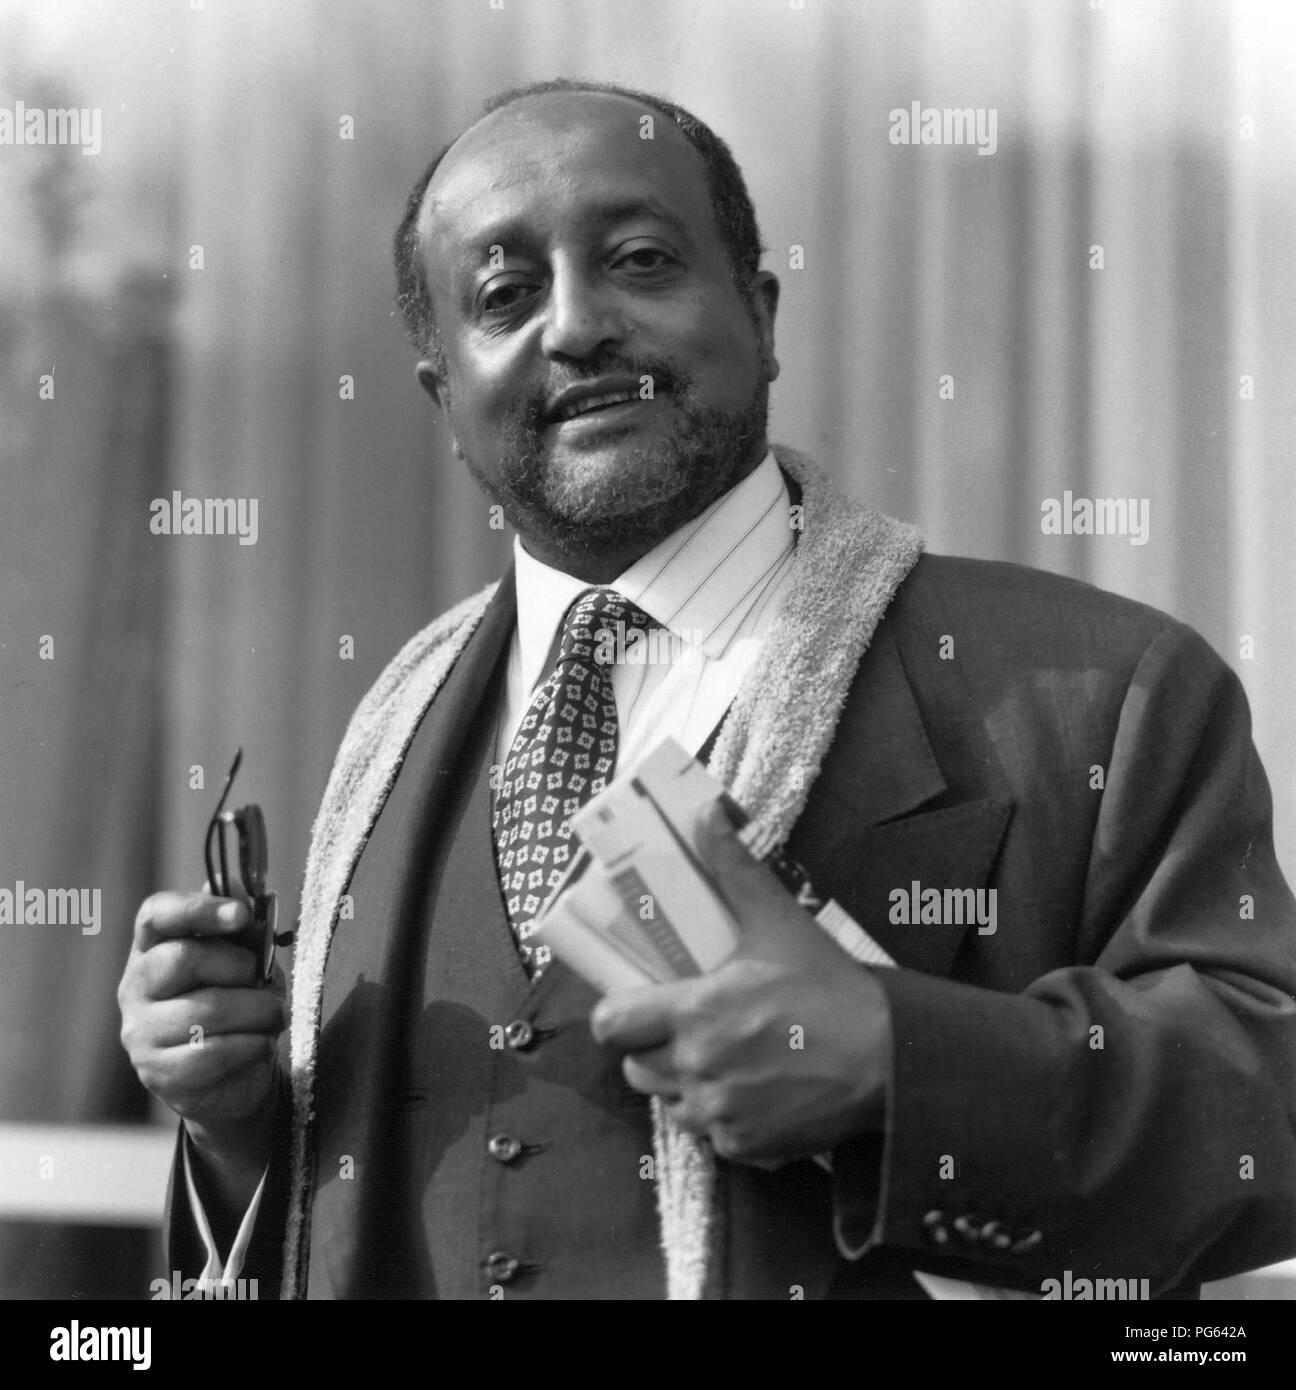 Ethiopian Emperor Black and White Stock Photos & Images - Alamy